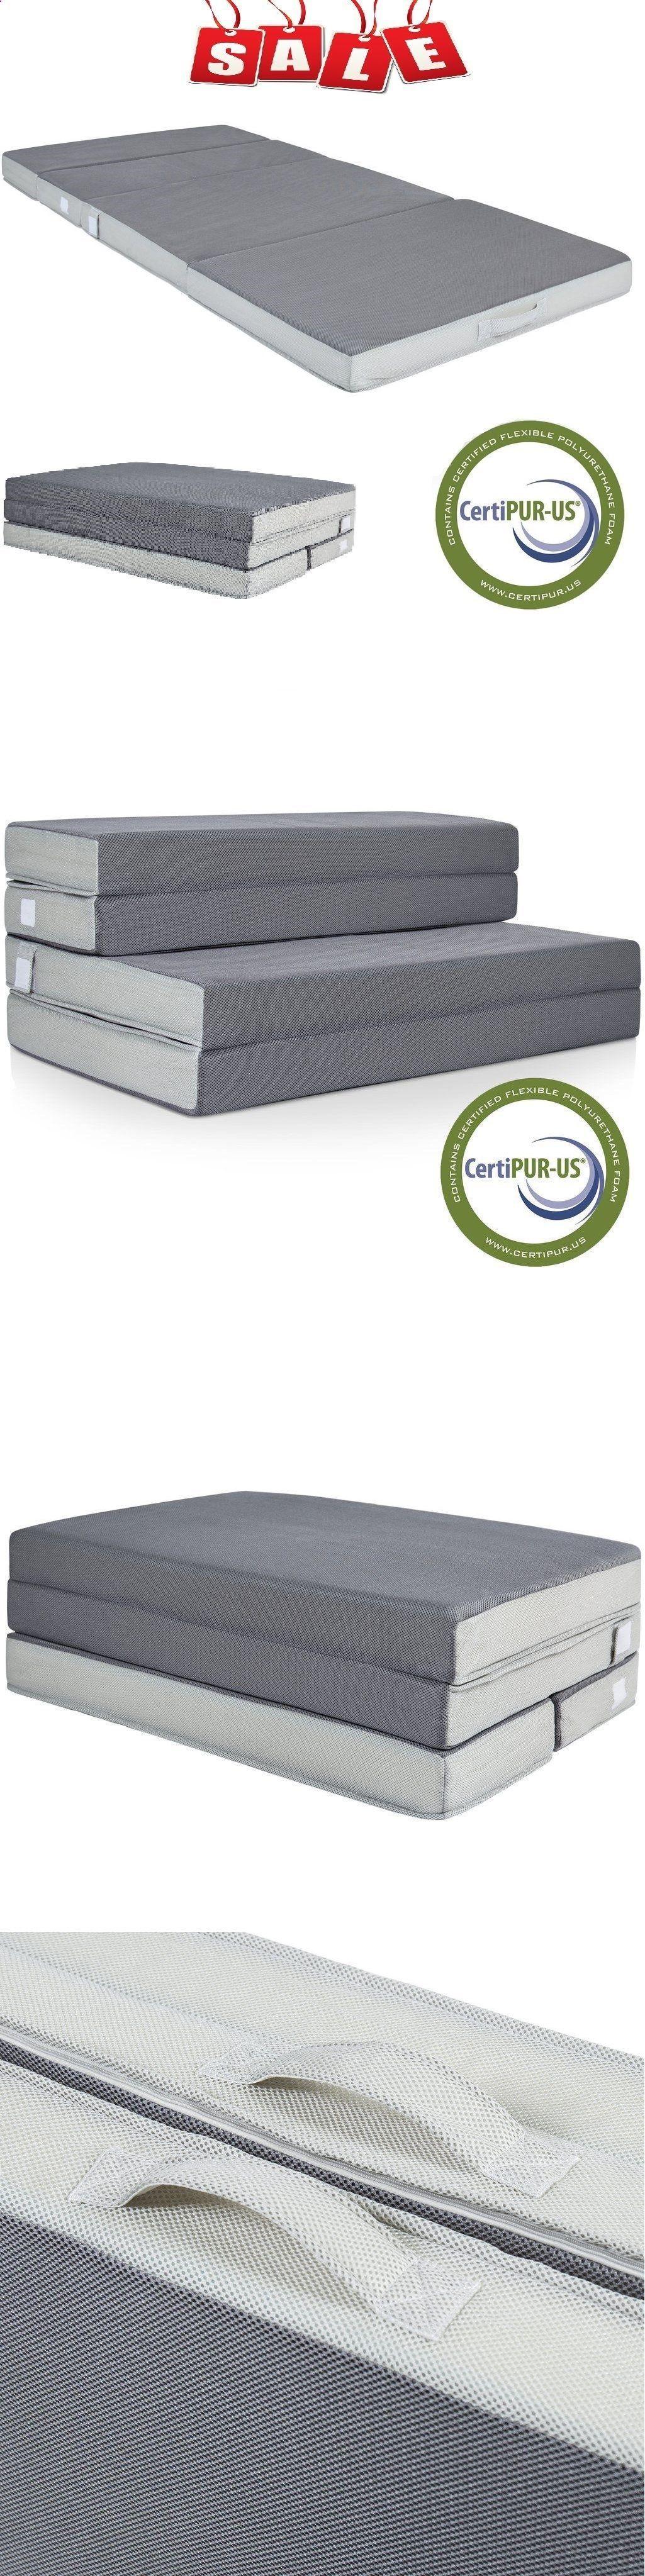 C&ing Sleeping Pad - Mattresses and Pads 36114 Folding Portable Queen Mattress Sleeping Pad C&ing & Camping Sleeping Pad - Mattresses and Pads 36114: Folding Portable ...